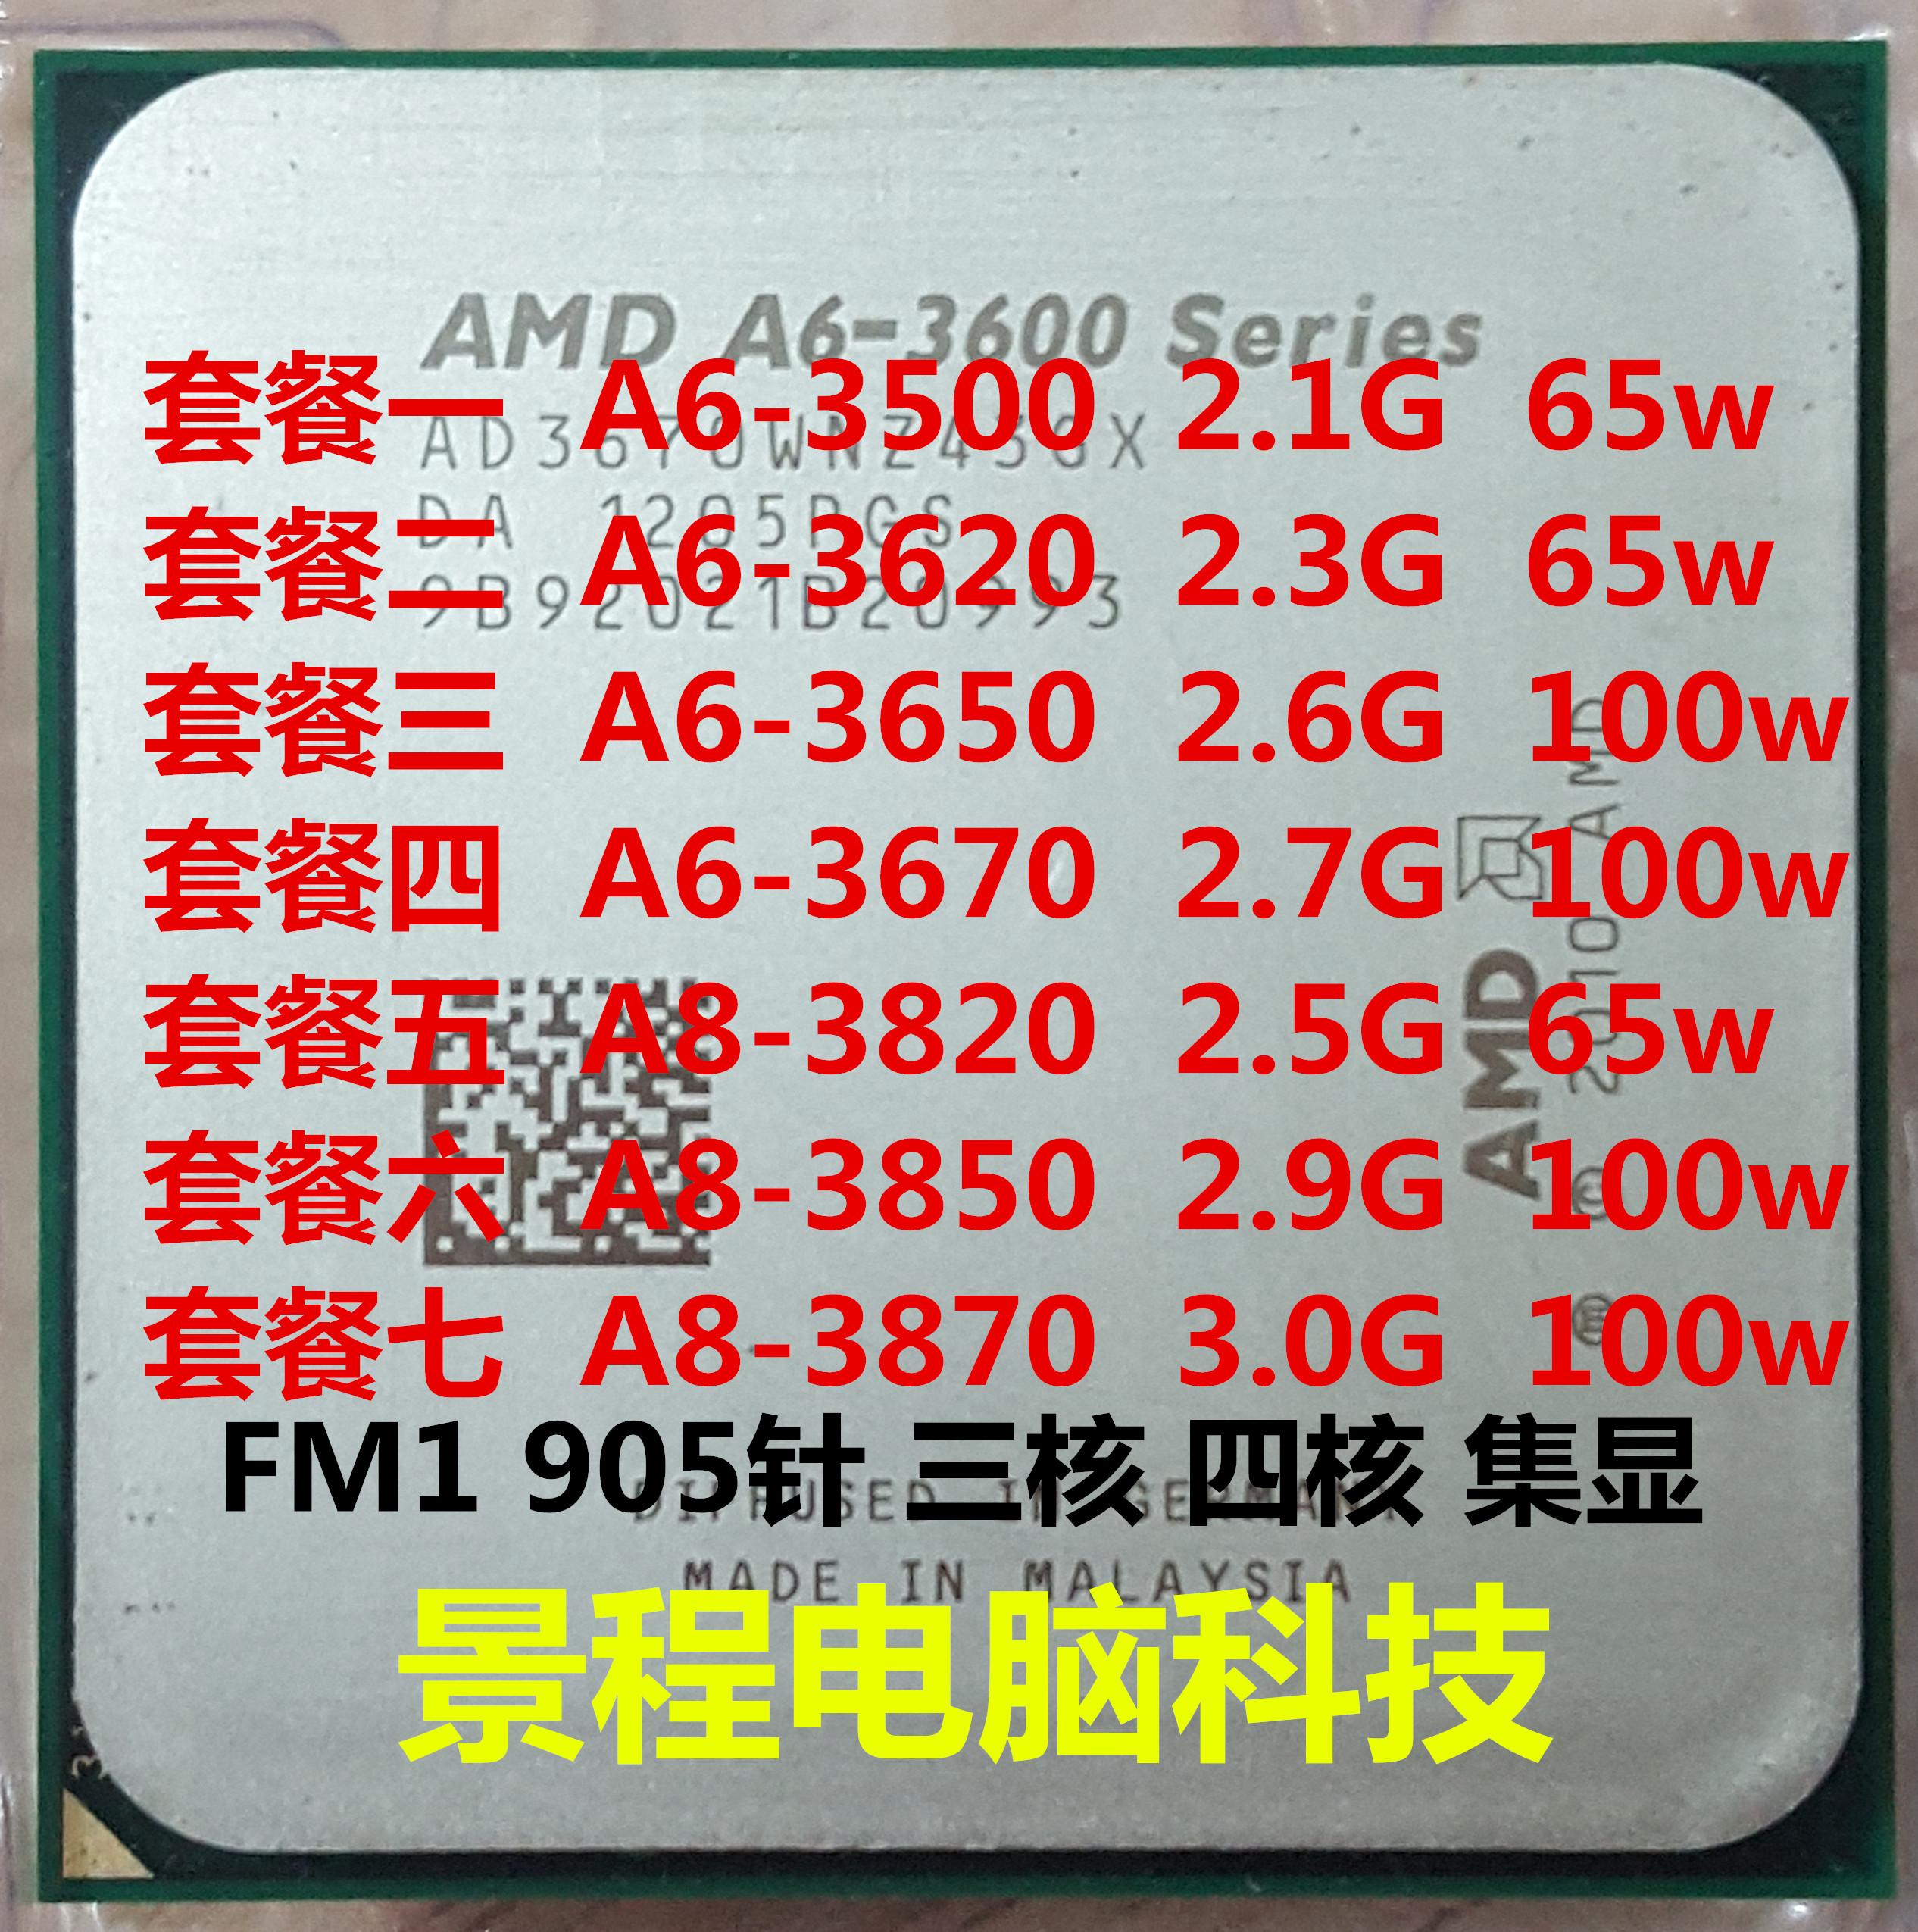 AMD A6-3650 3670 a8 3820 3850 3870 台式机CPU 四核FM1 905针